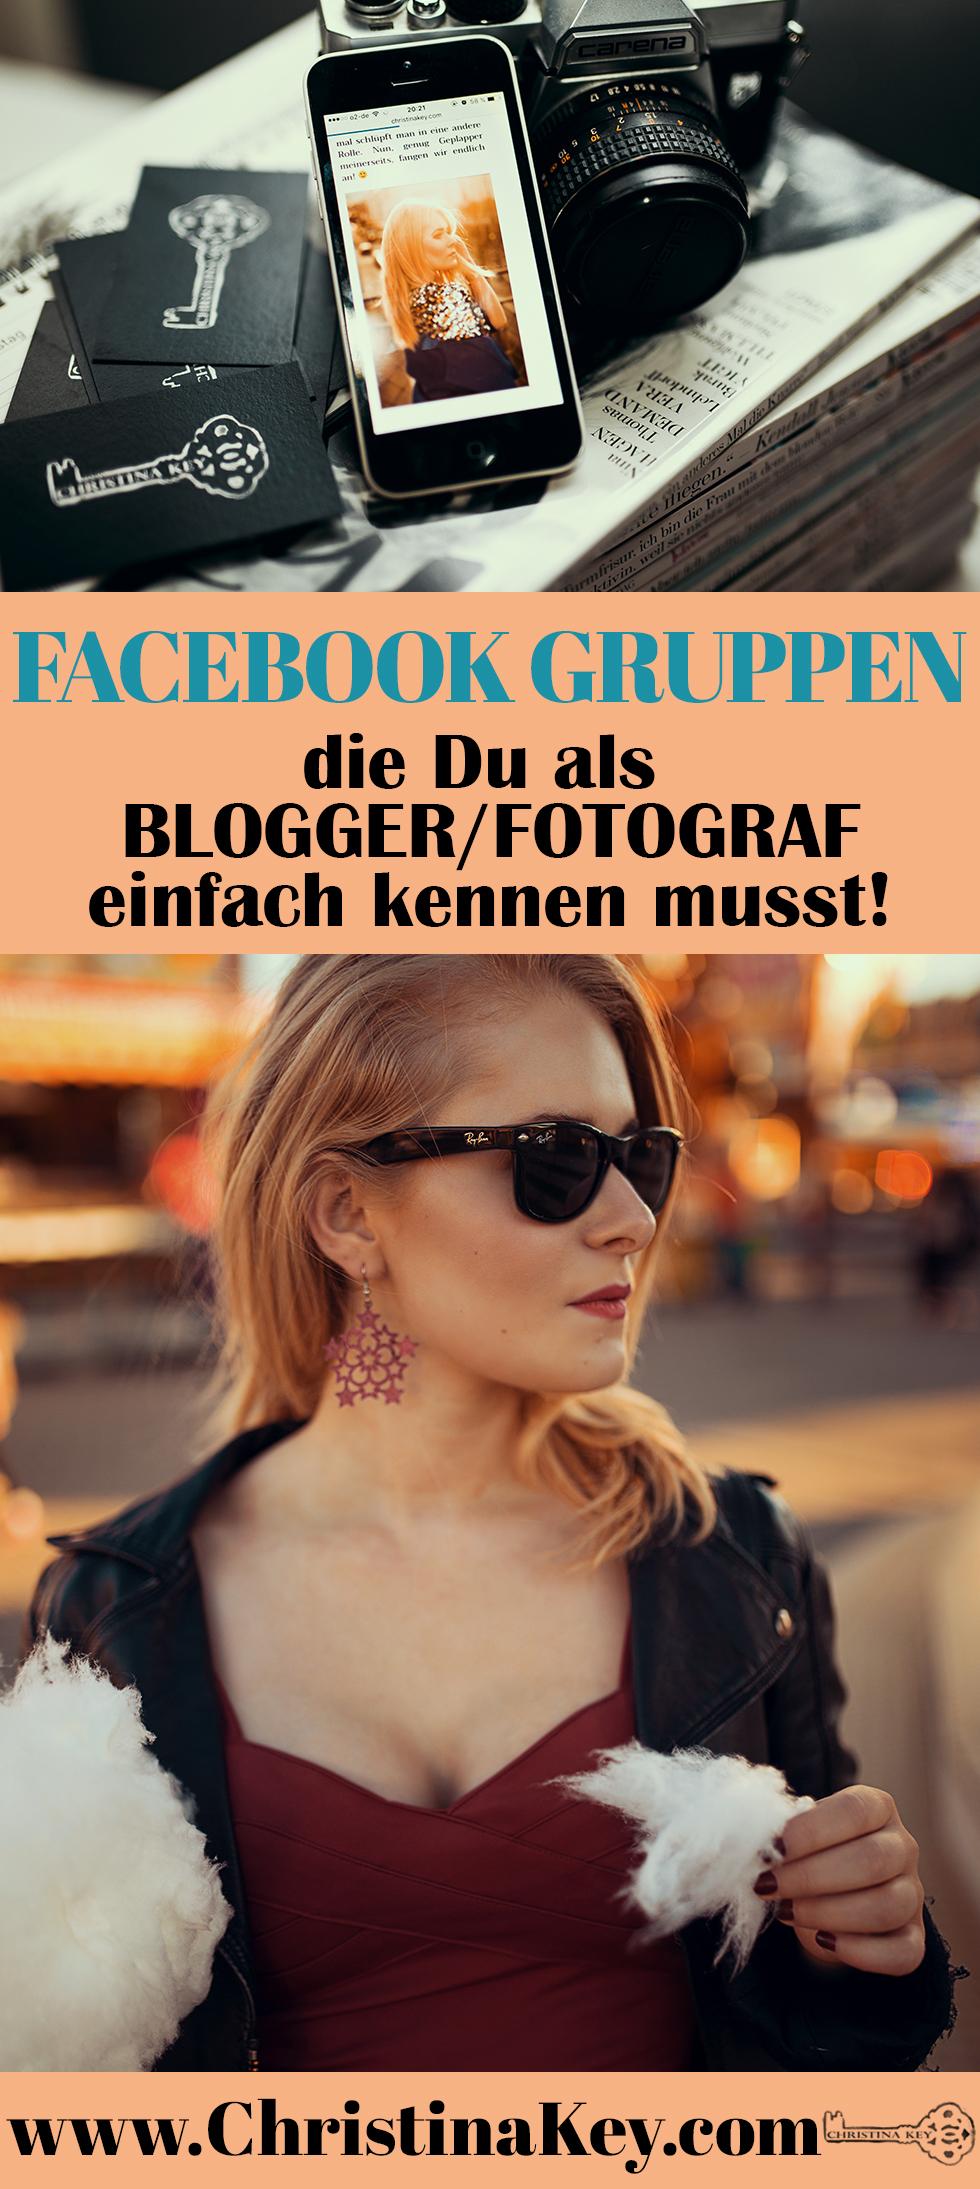 Facebook Gruppen die Du als Blogger Fotograf kennen musst